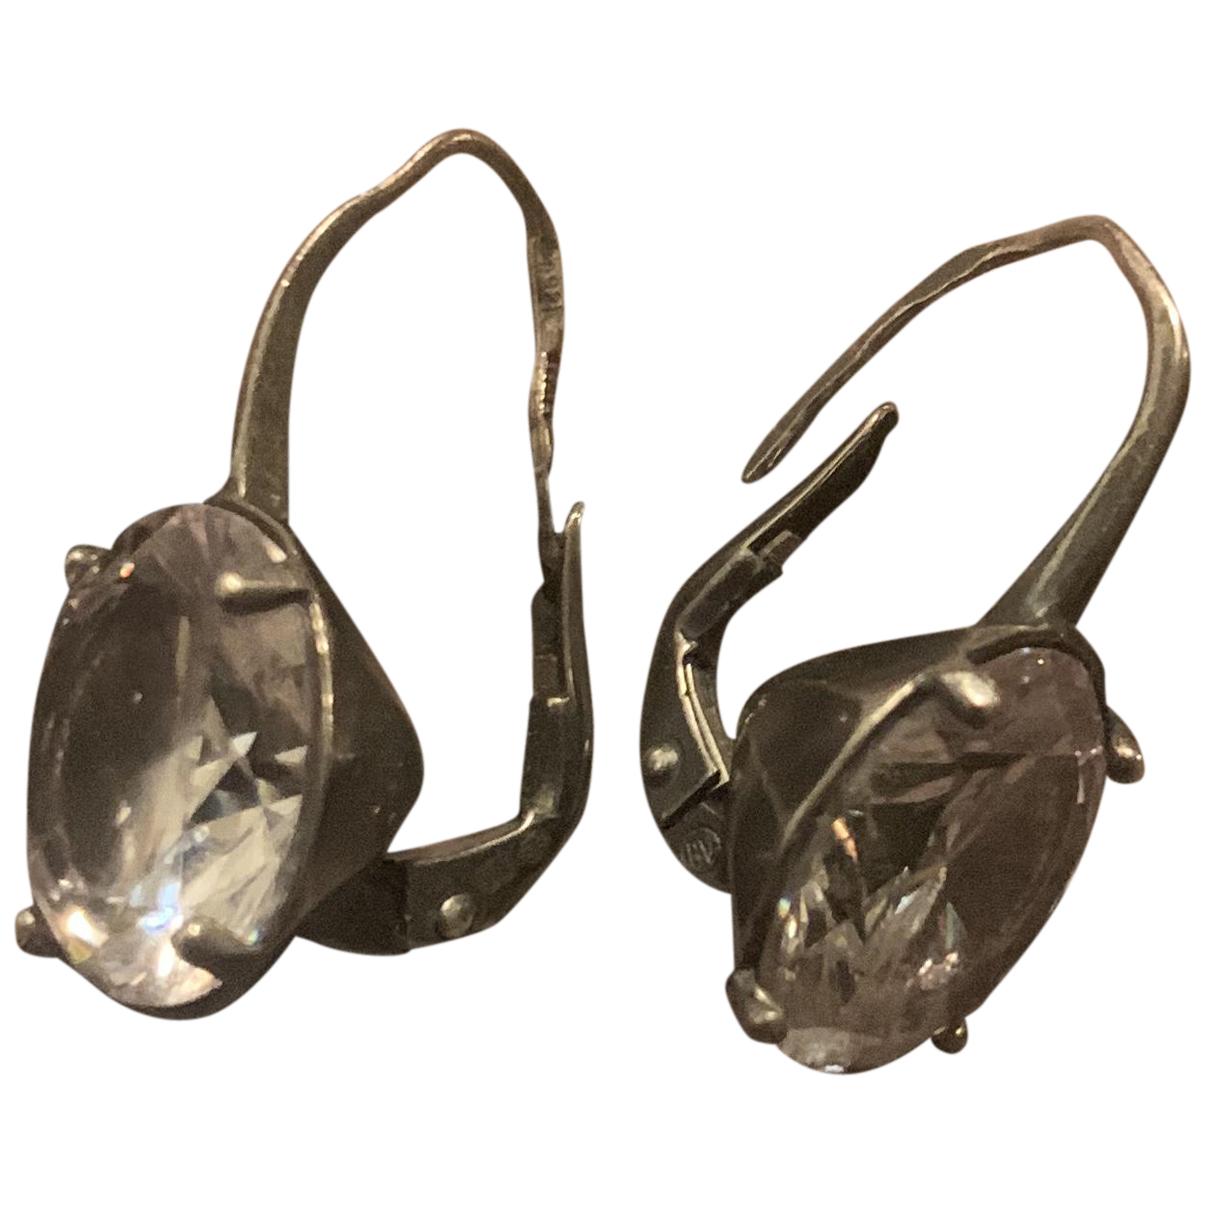 Bottega Veneta N Silver Silver Earrings for Women N